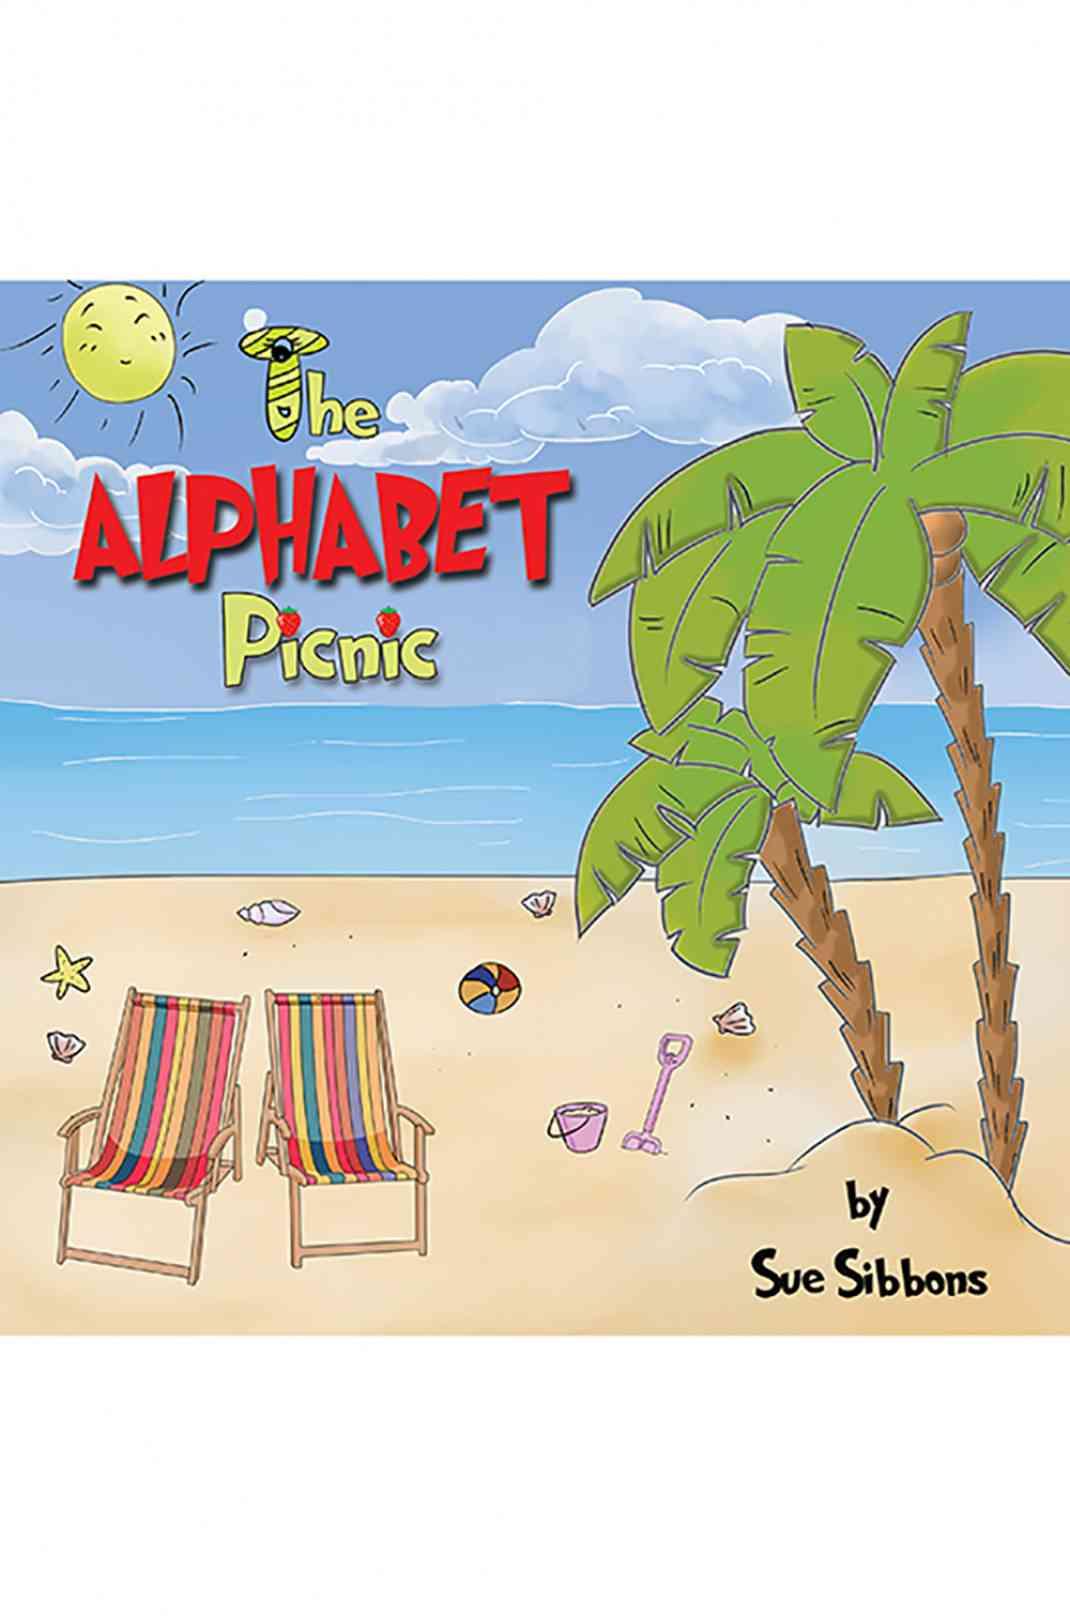 The Alphabet Picnic